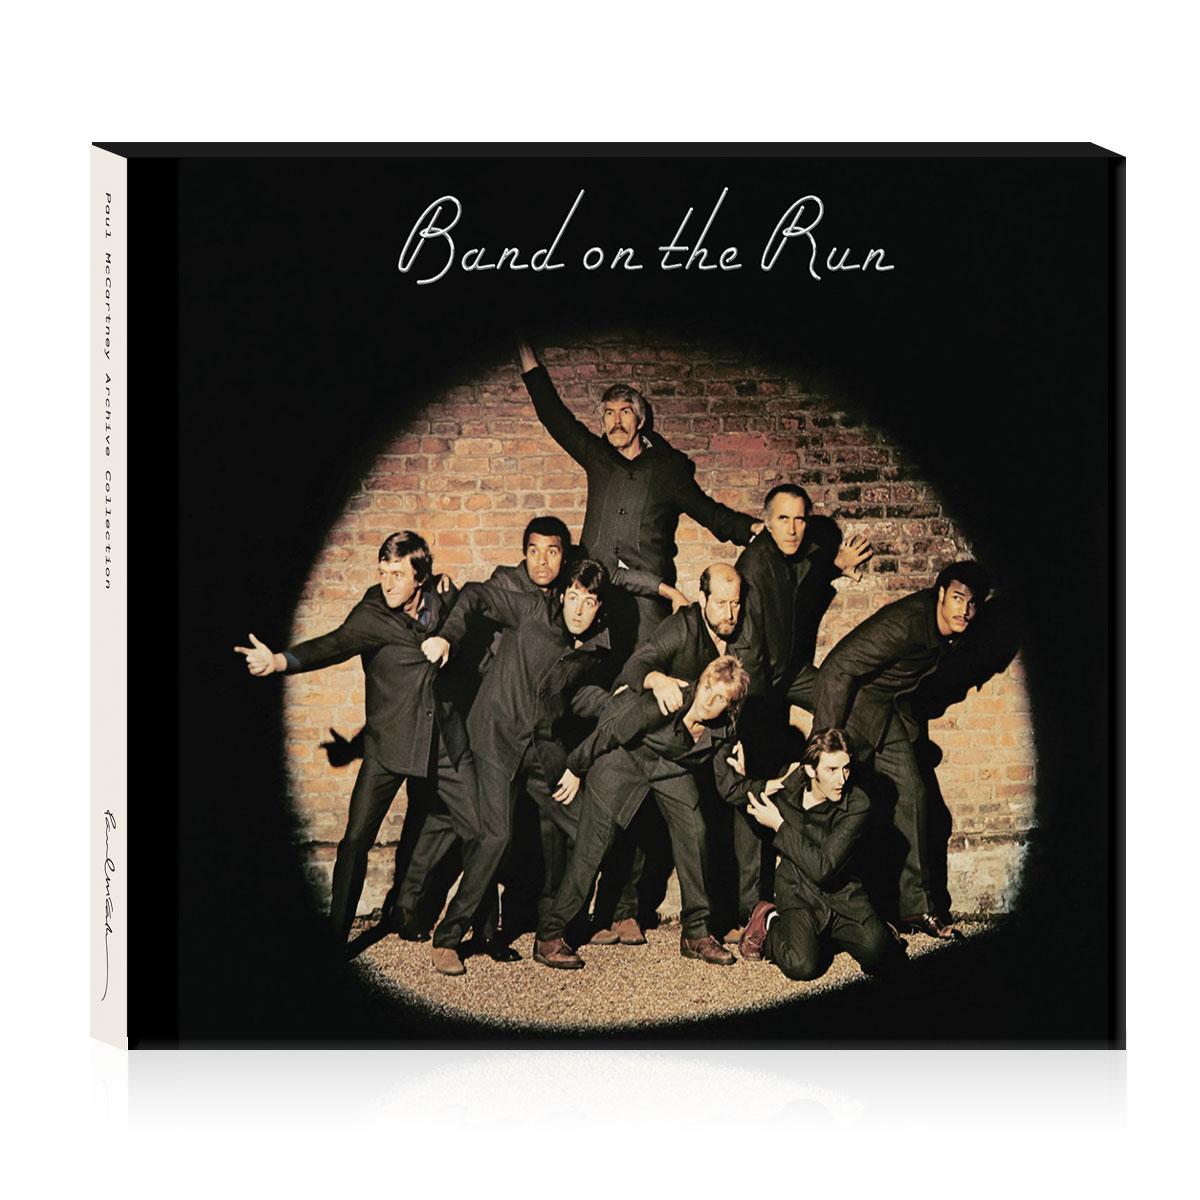 CD IMPORTADO Paul McCartney Band on the Run